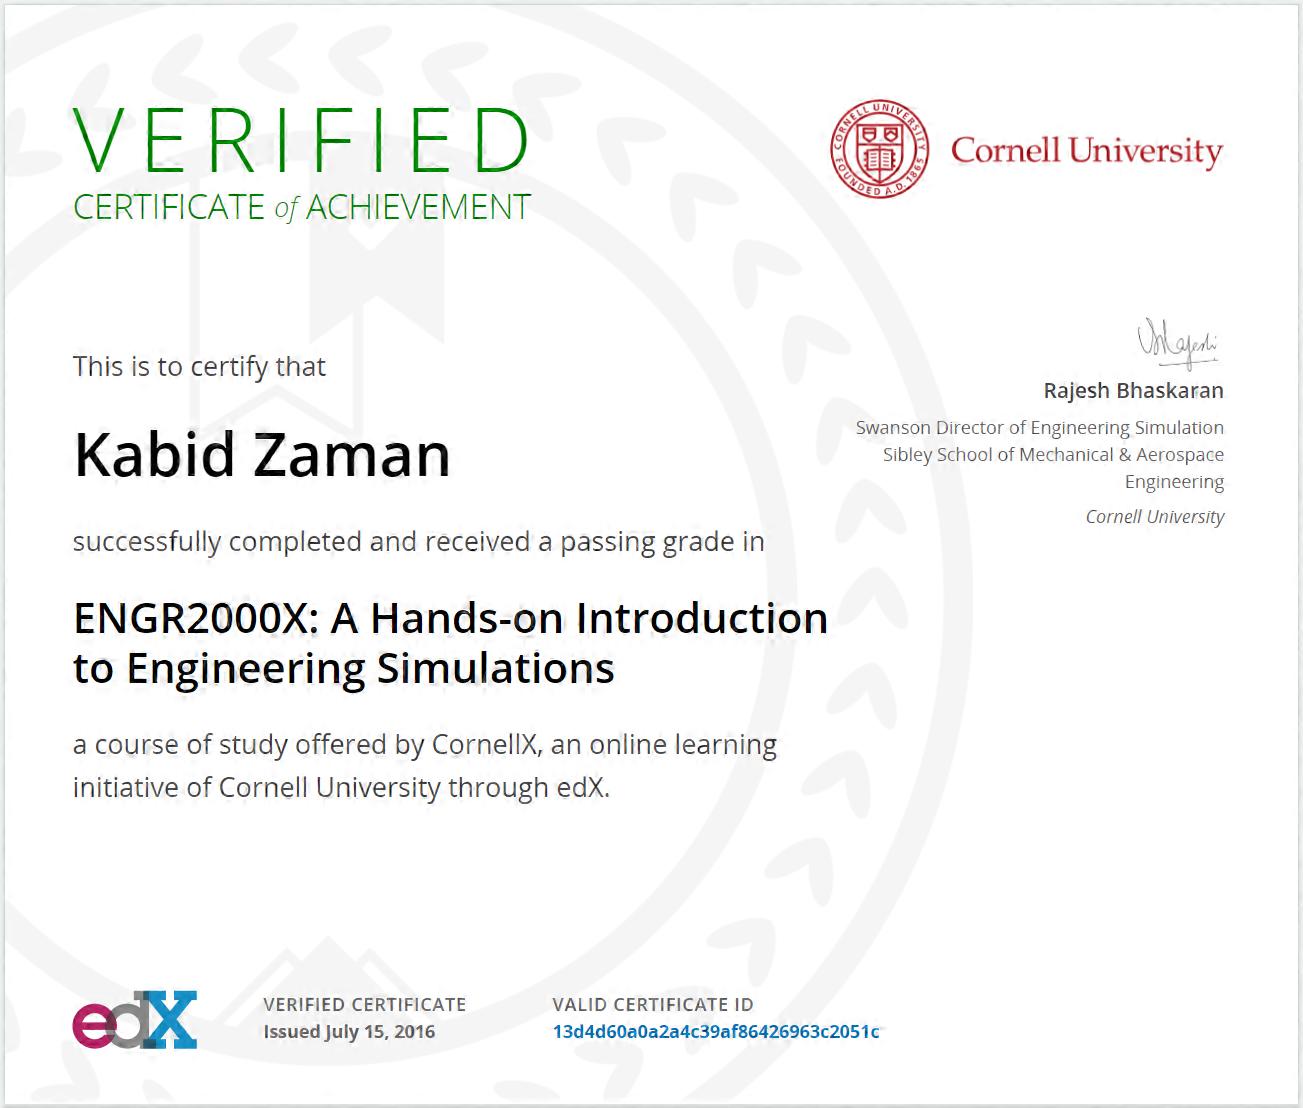 Engineering Simulations CornellX ENGR2000X Certificate